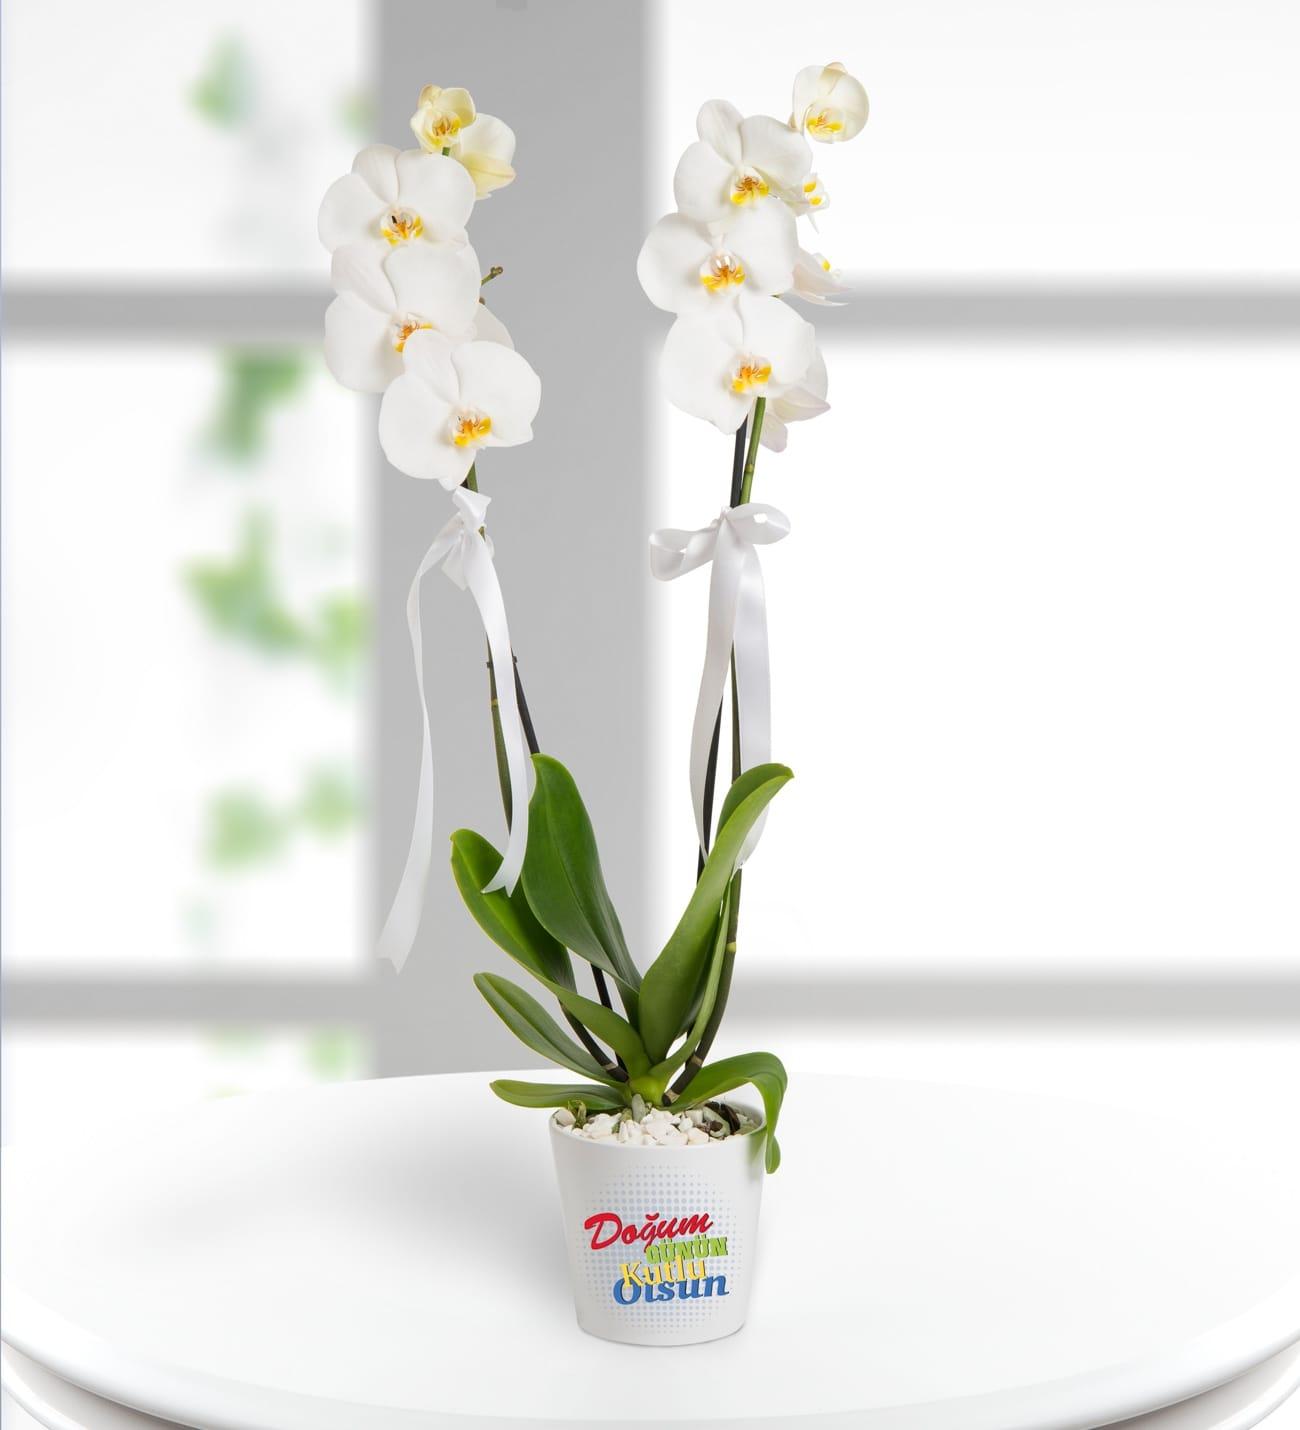 Dogumgünü mesajlý 2dal beyaz orkide